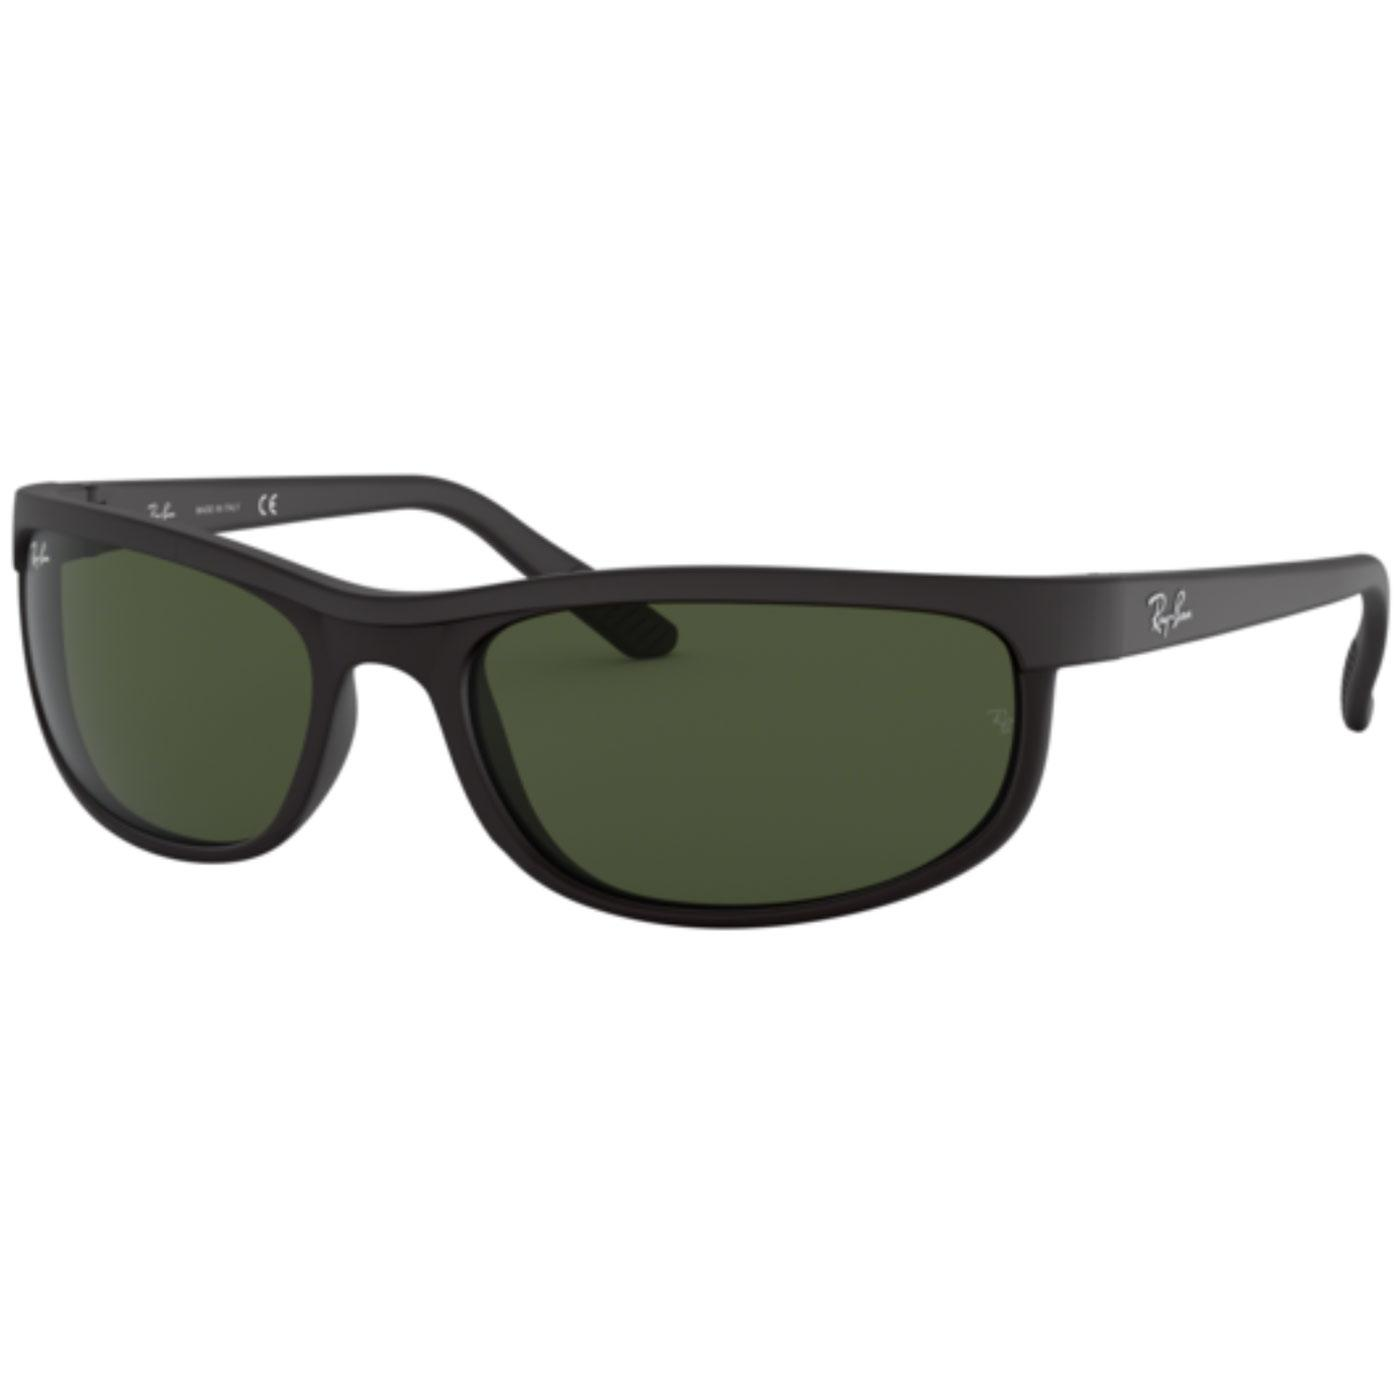 RAY-BAN Predator Retro Wrap Round G-15 Sunglasses